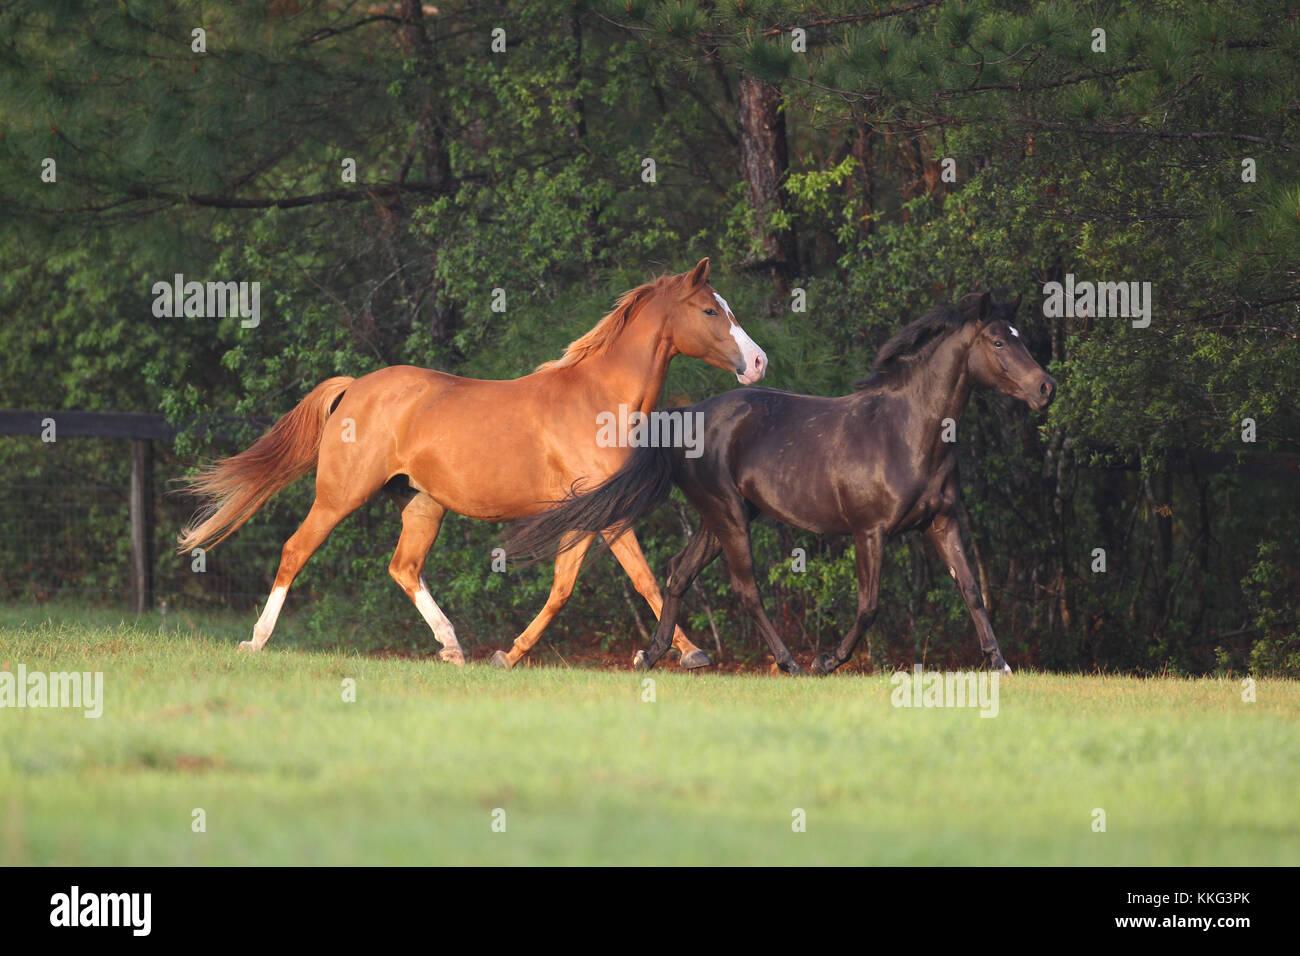 Alemán Caballo poni y Oldenburg X Welsh Pony trote por bosques Imagen De Stock